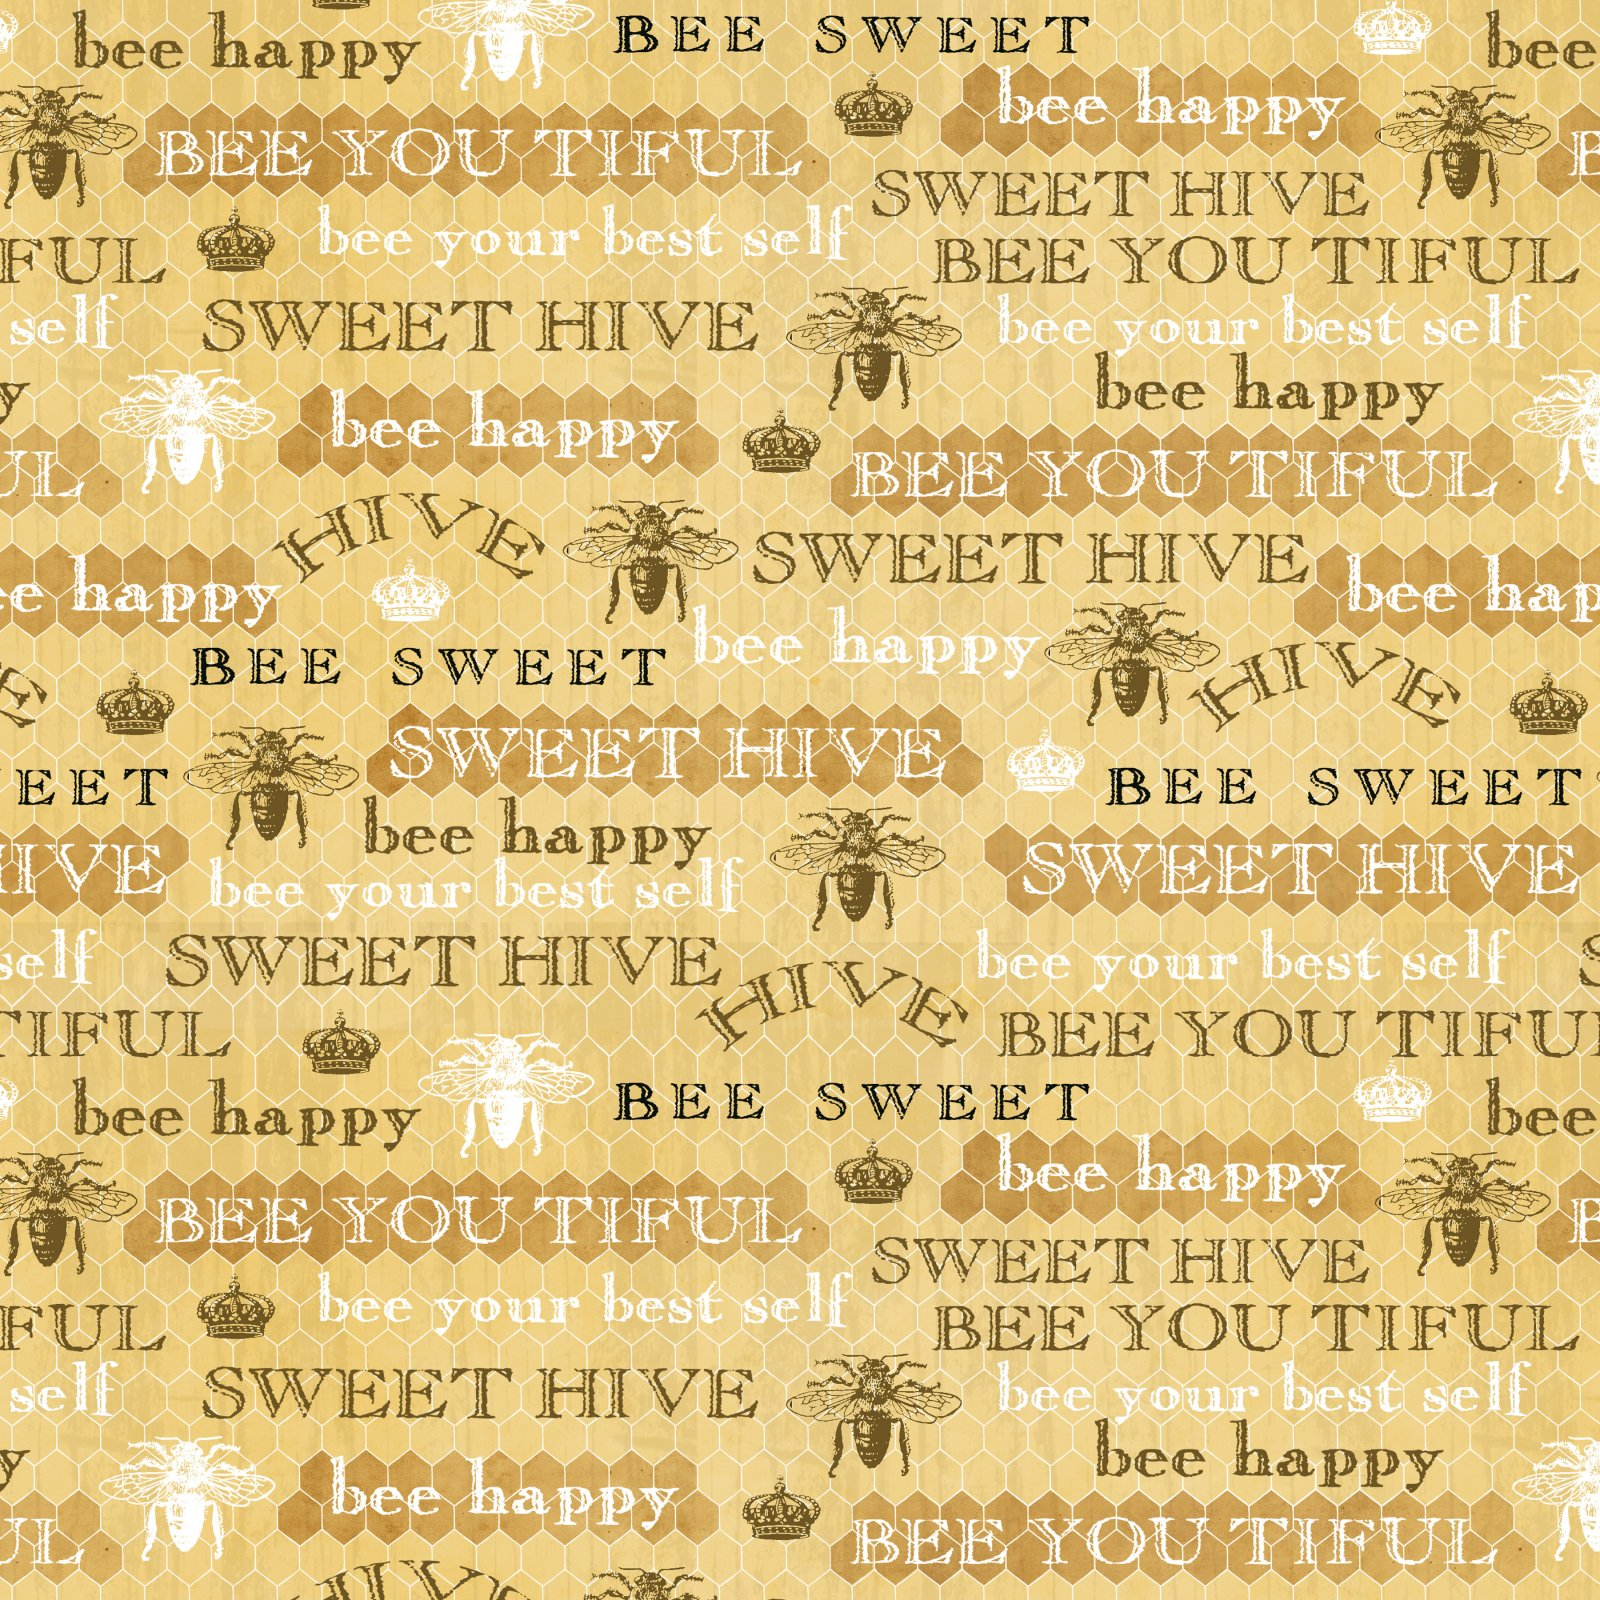 Bee Sweet Words on Honeycomb